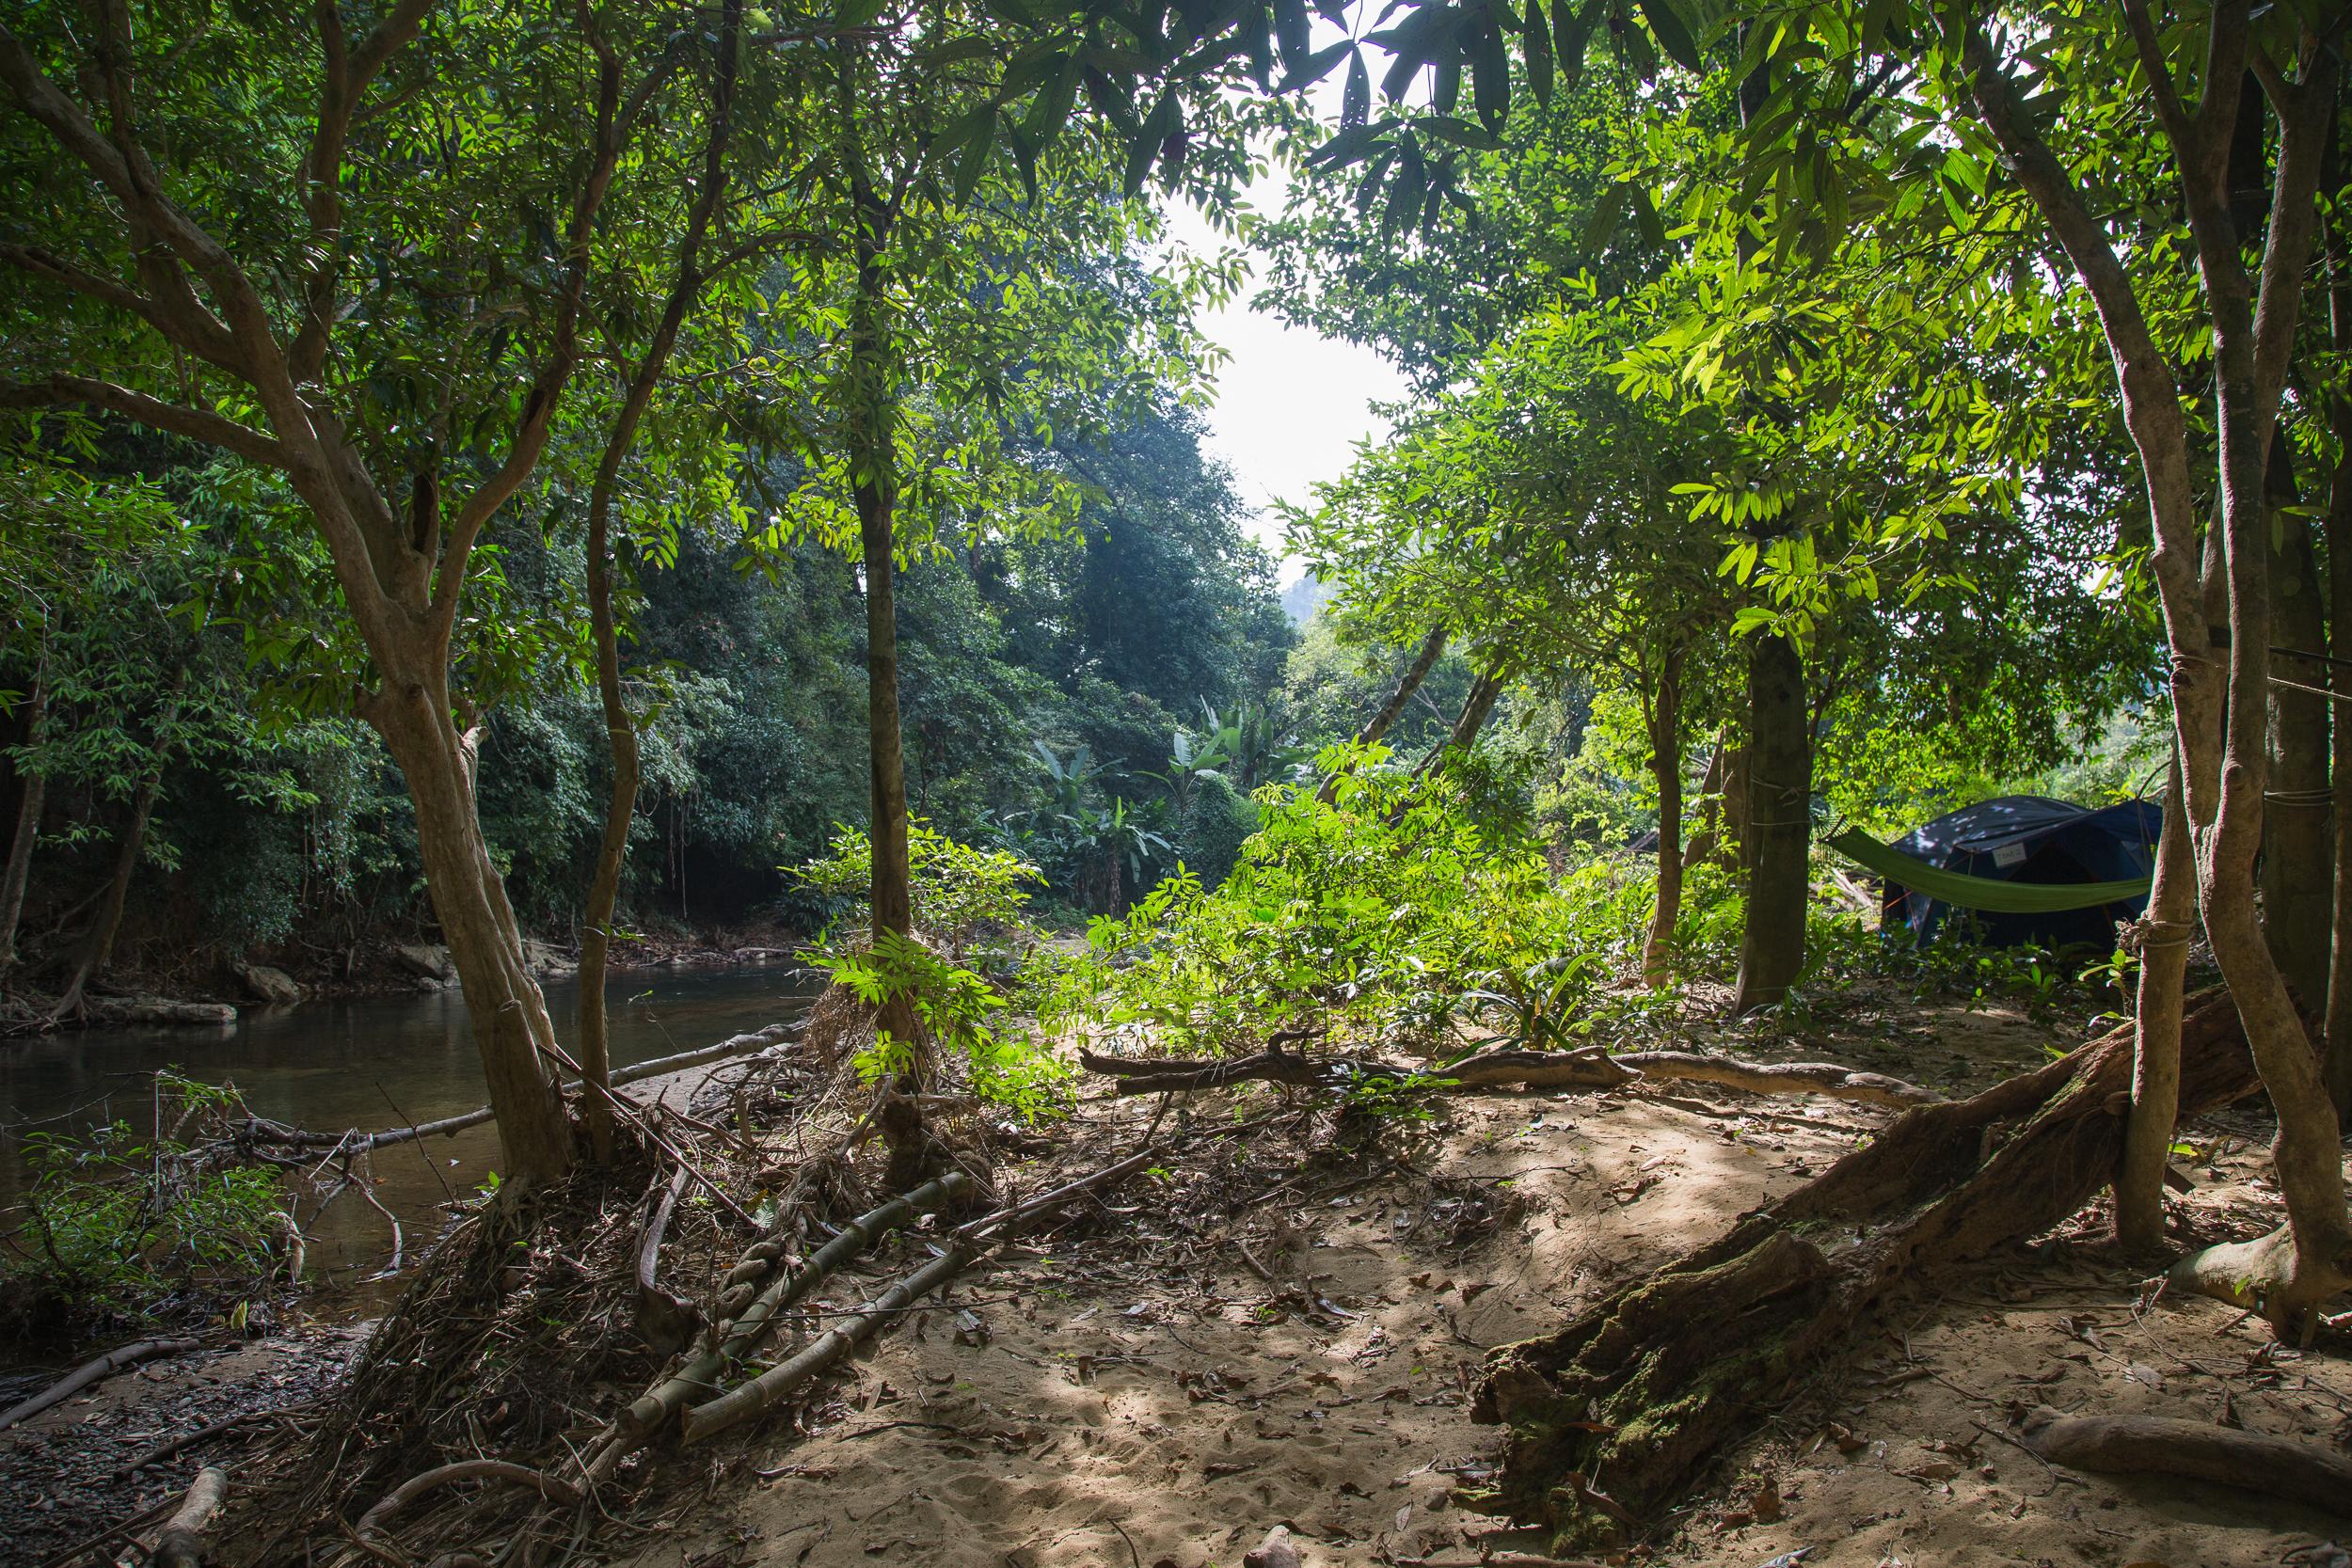 Sunshine peeks through the rainforest canopies.